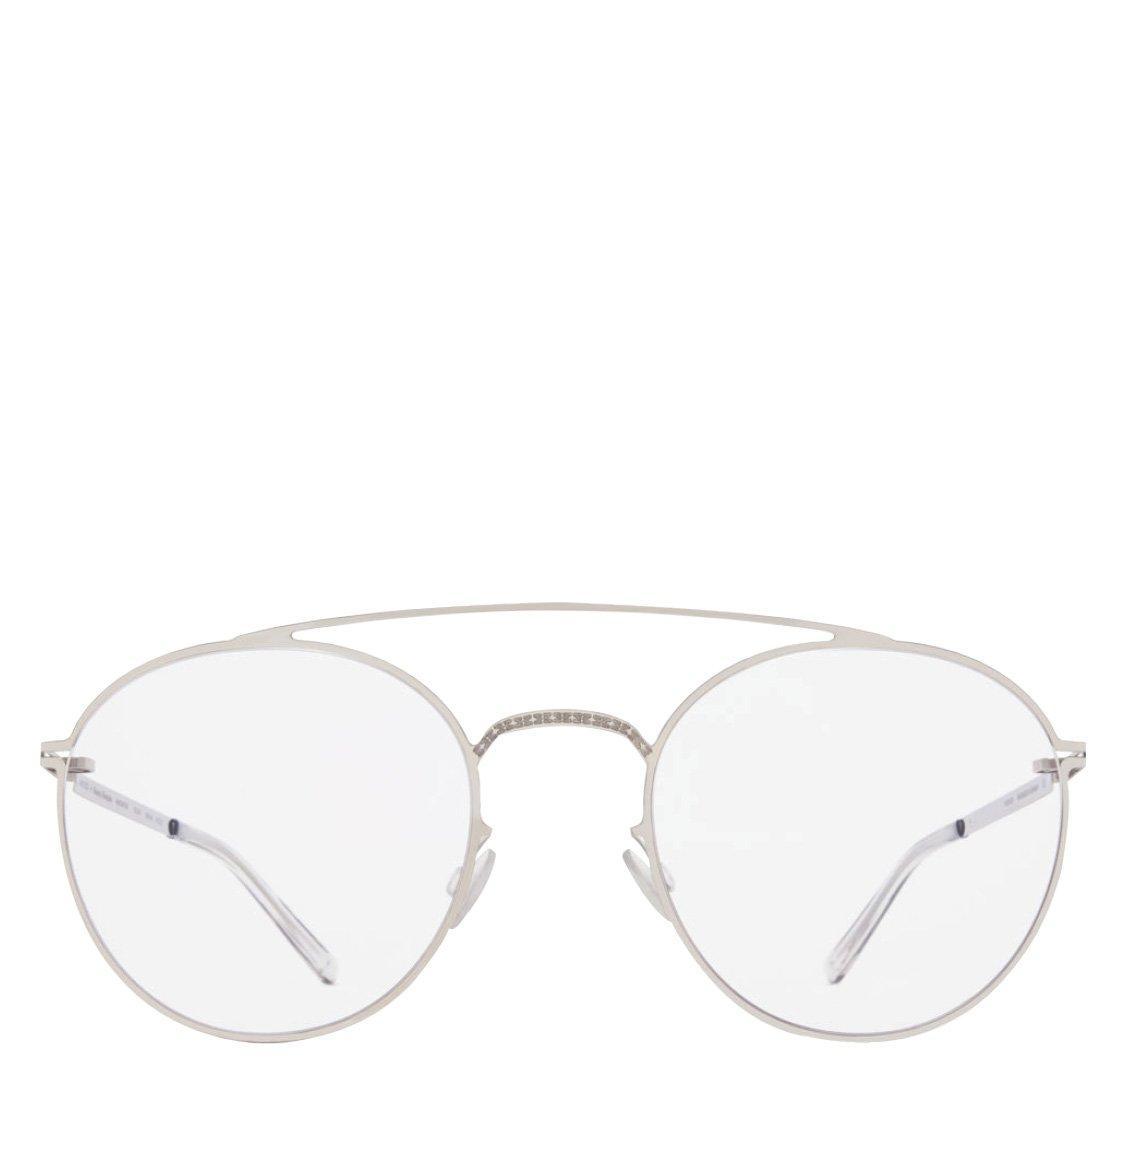 Mykita x Maison Martin Margiela Panto-Shaped Frame Silver Sunglasses